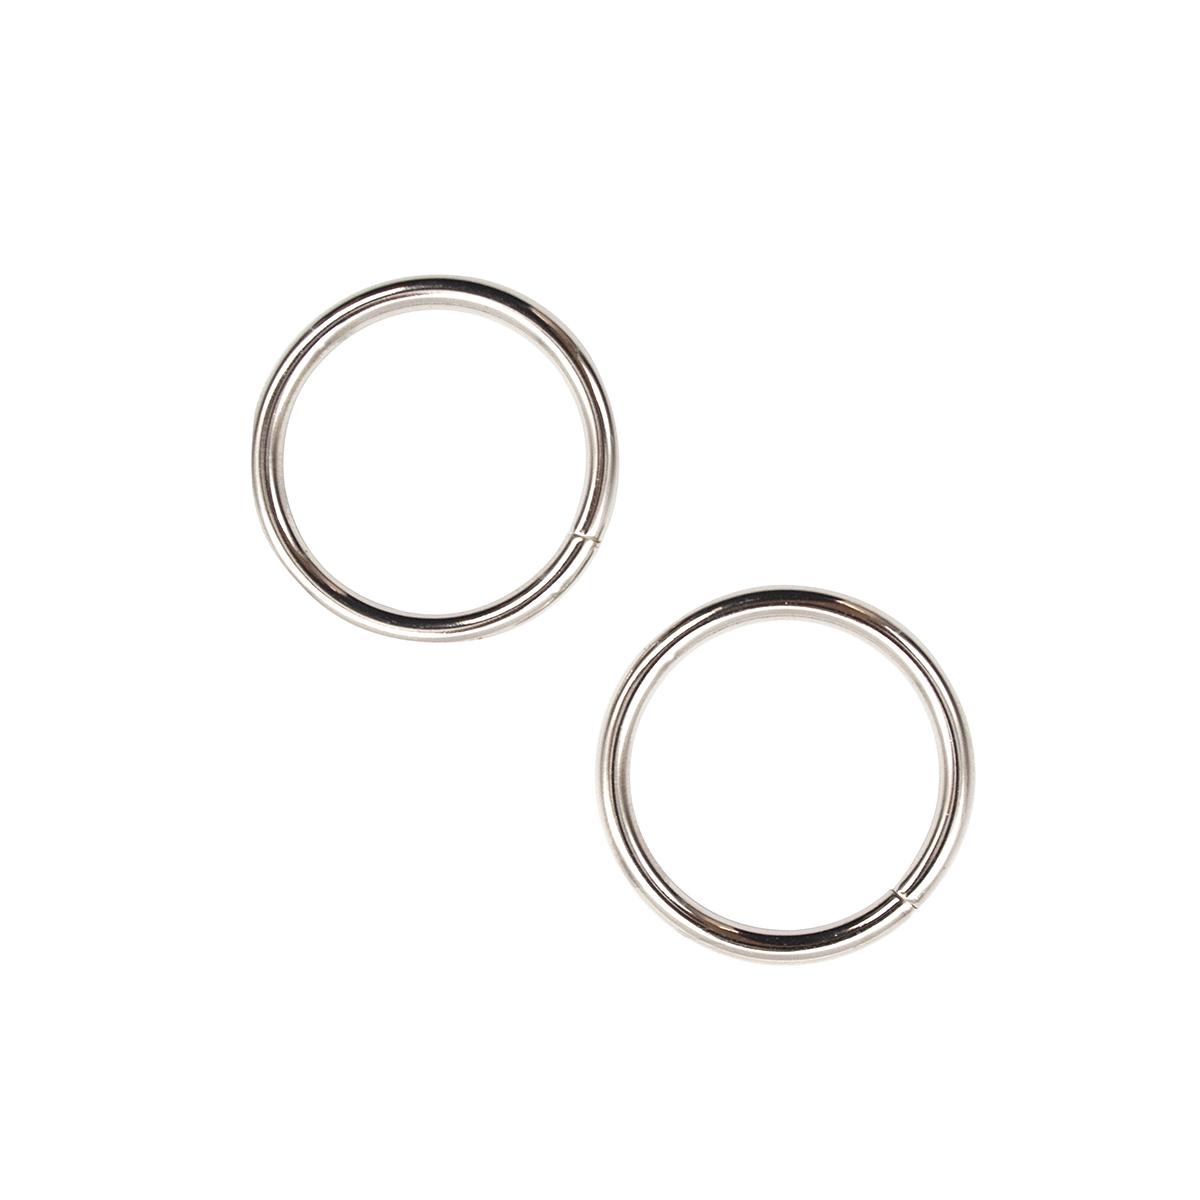 816-008 Кольцо разъемное, 30*3,5 мм, упак/2 шт, Hobby&Pro